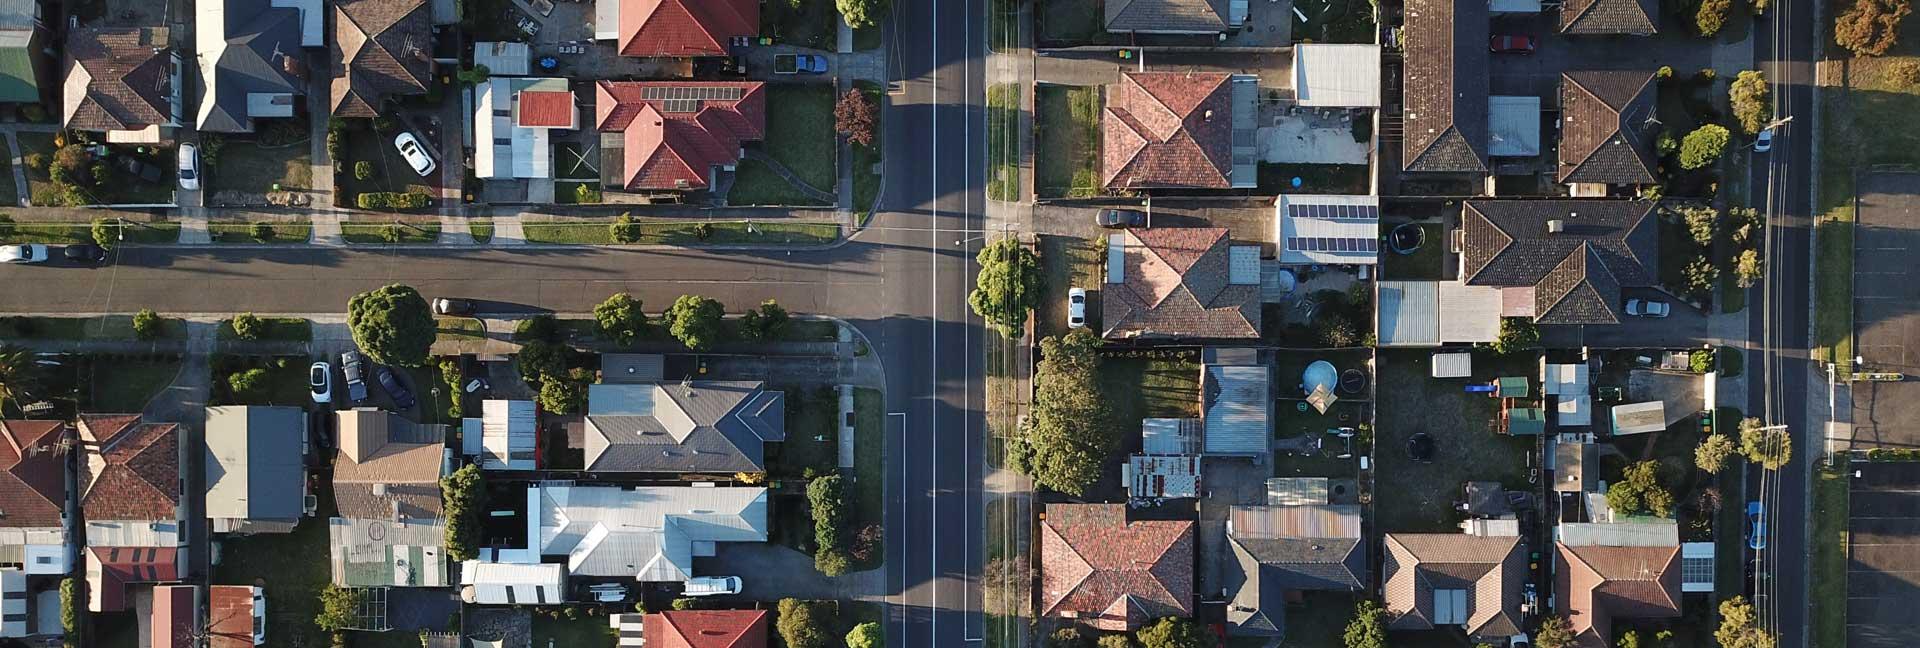 overhead aerial view of residential neighbourhood